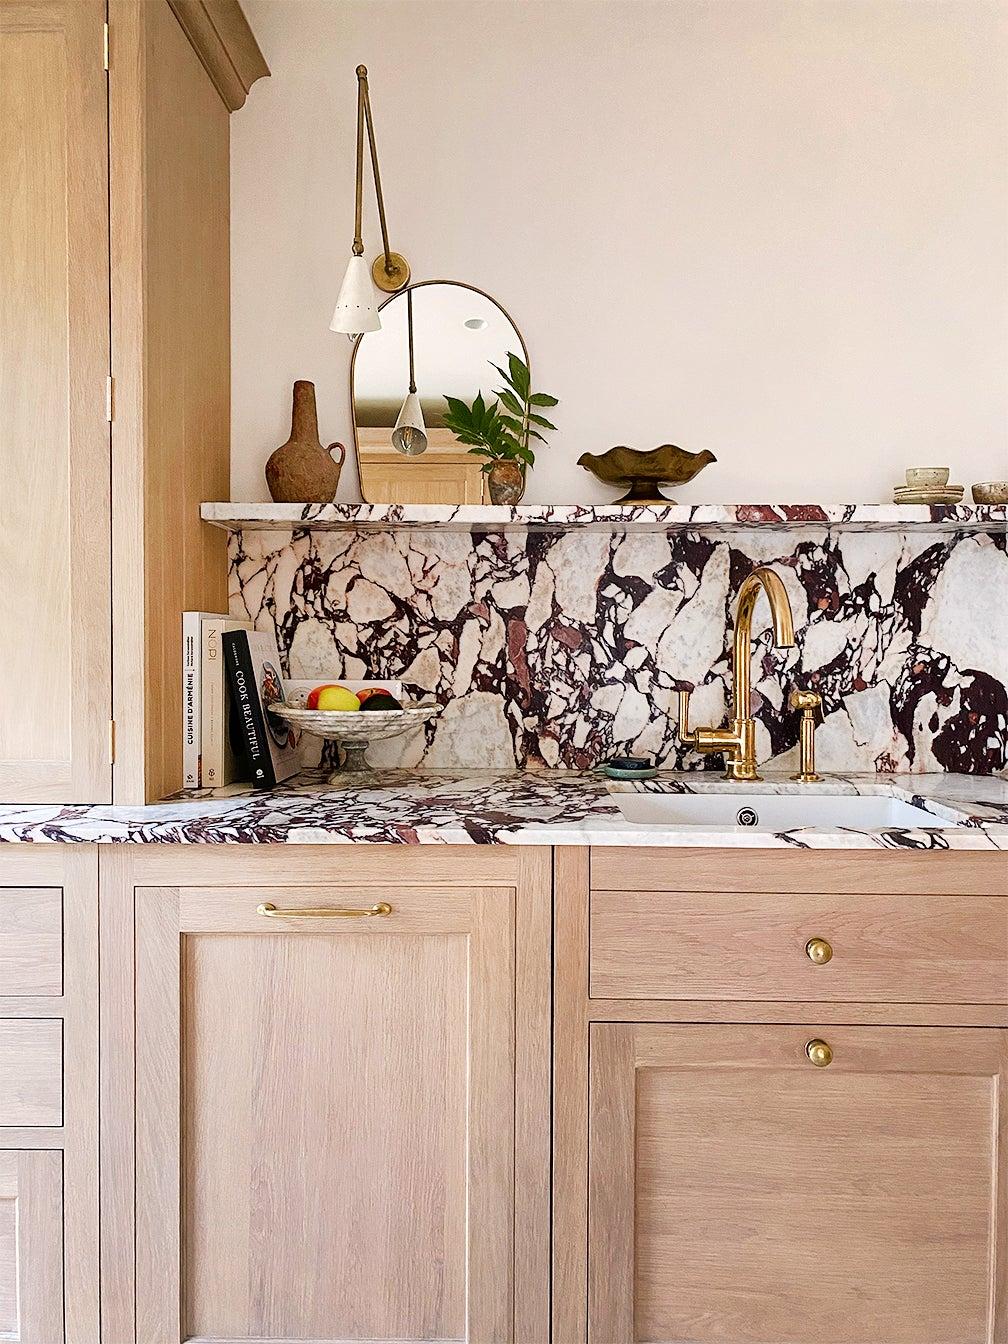 Purple marble backsplash in kitchen